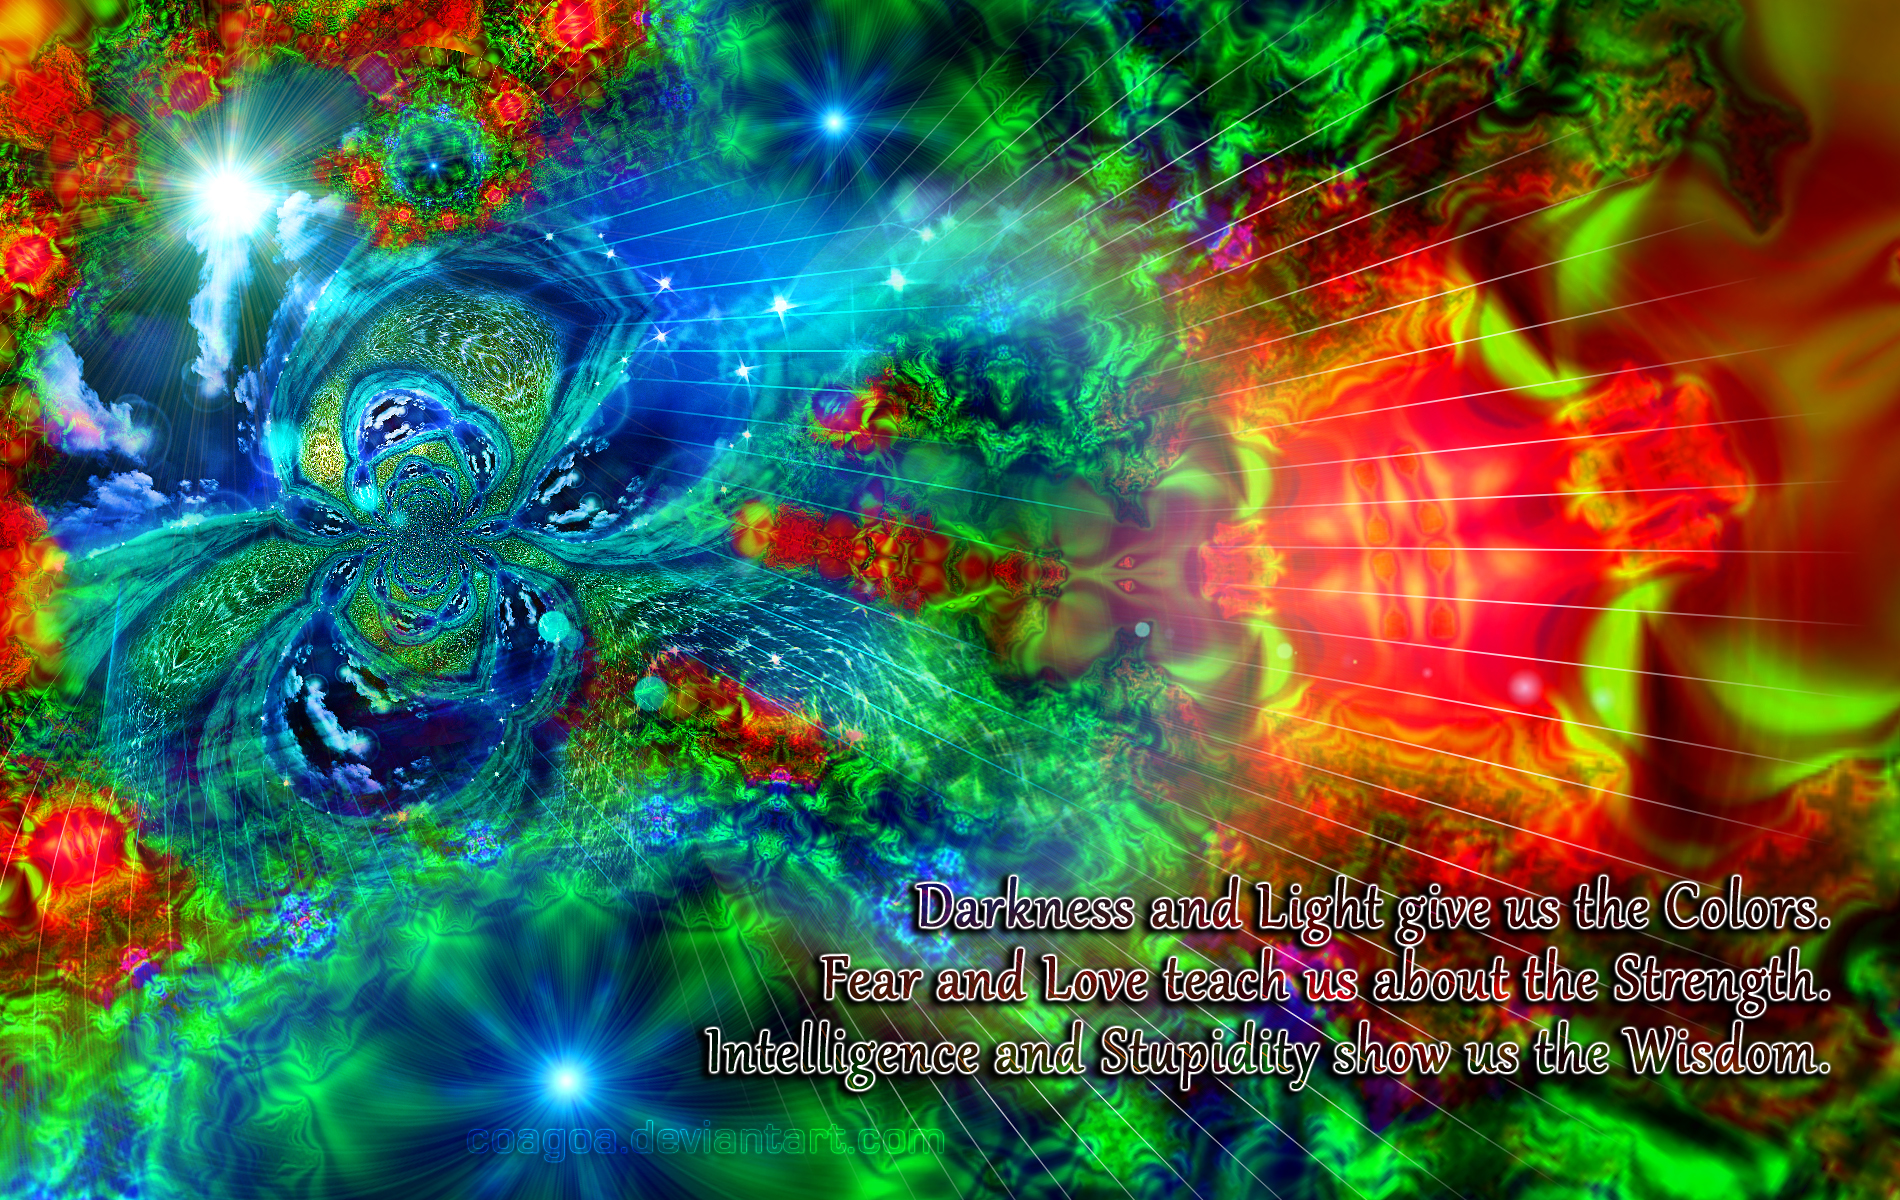 Colors Of Wisdom by CoaGoa